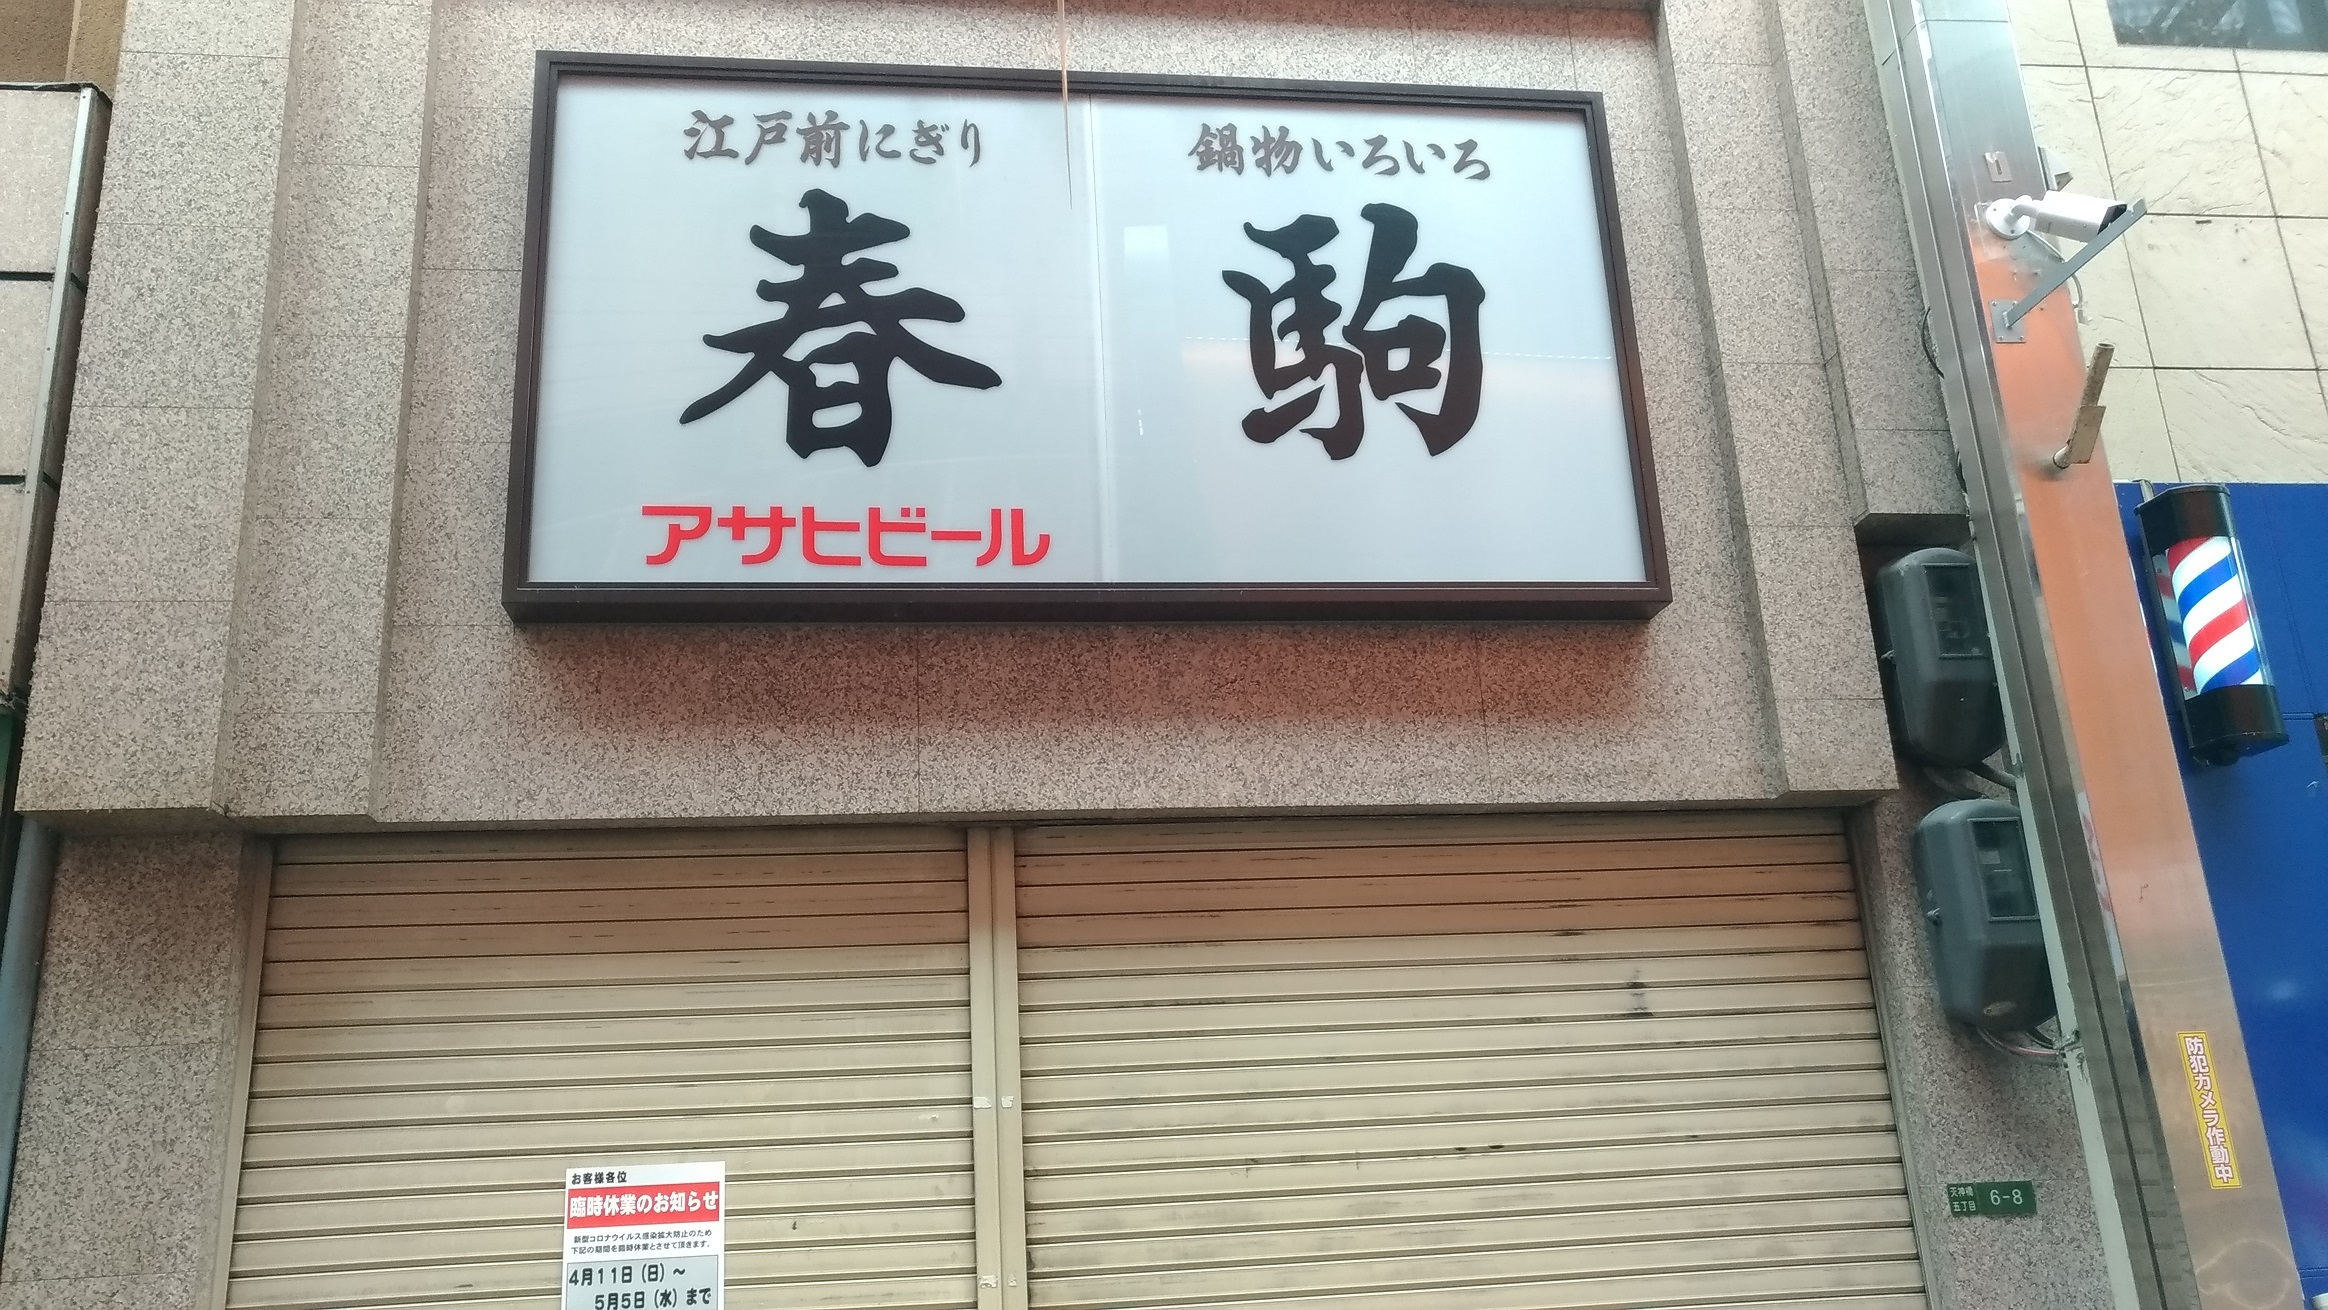 harukoma_sushi_tenma_0423_2021_12.jpg